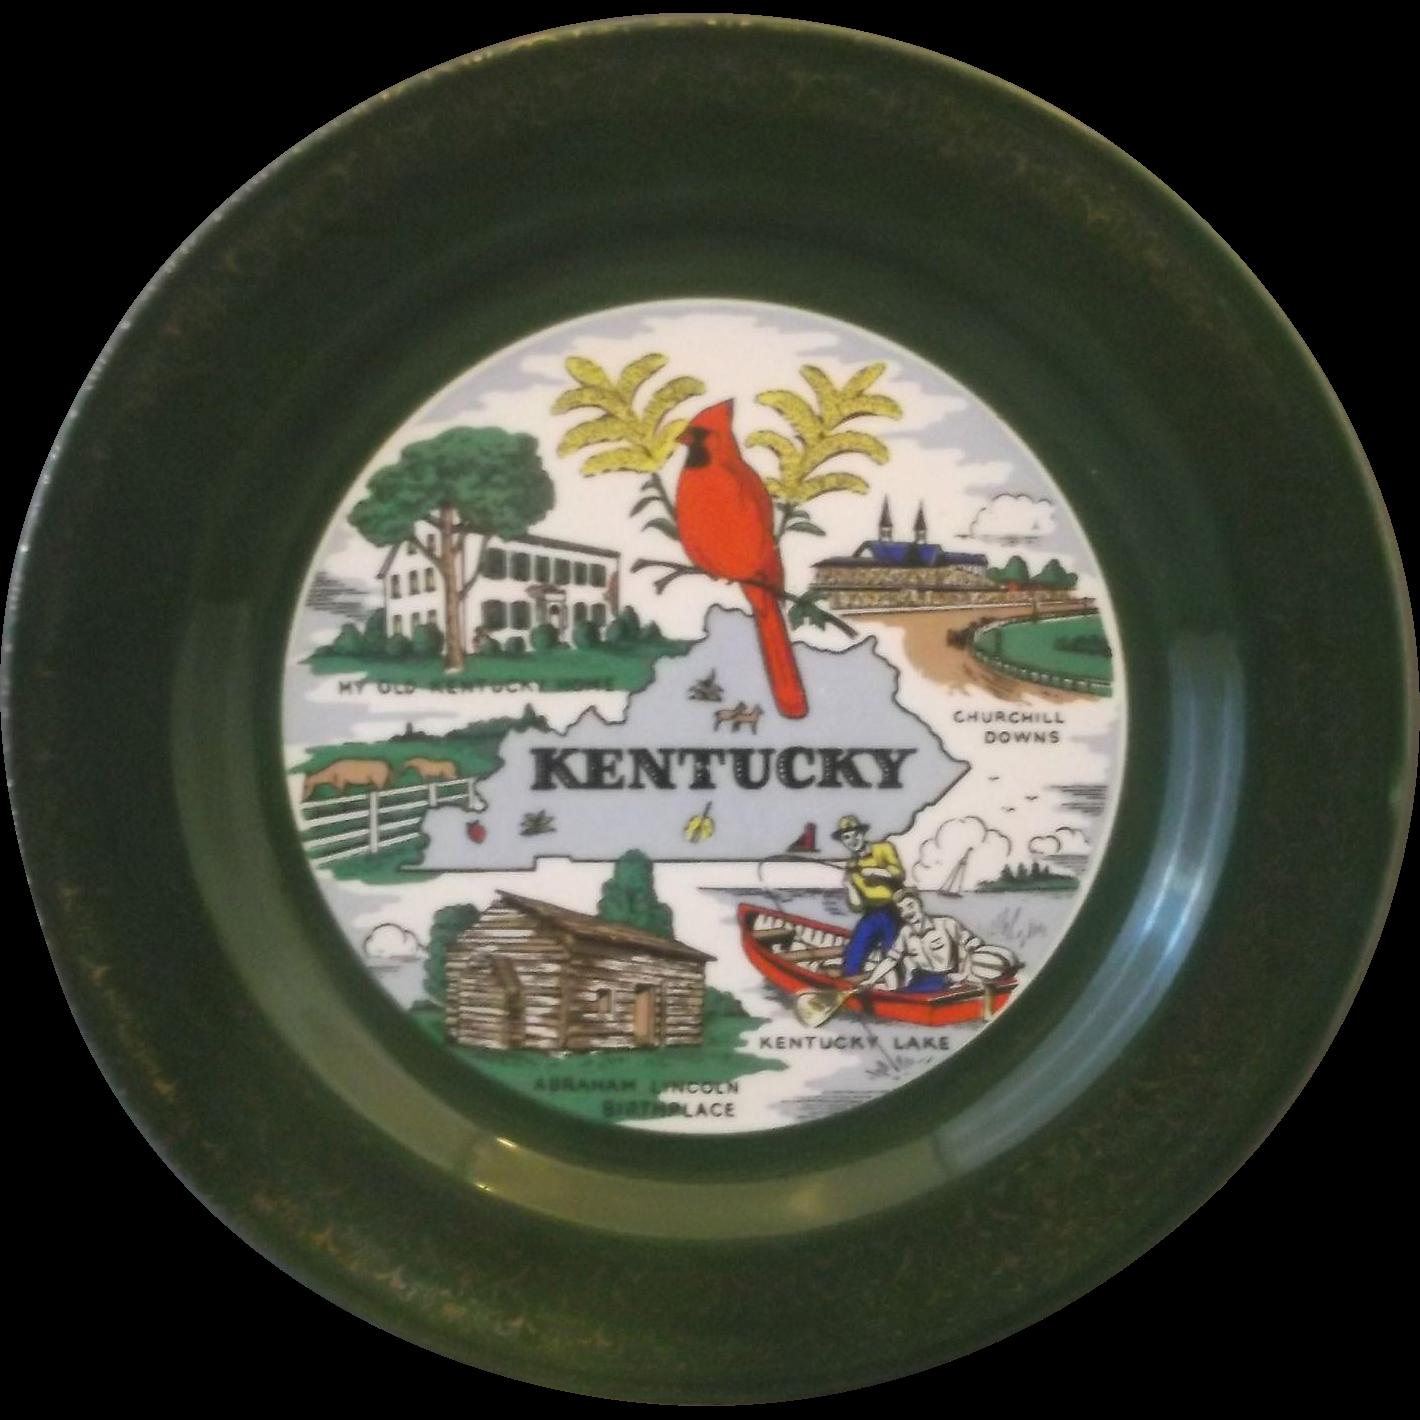 Kentucky State Souvenir Plate Homer Laughlin Dark Green Gold Encrusted Rim